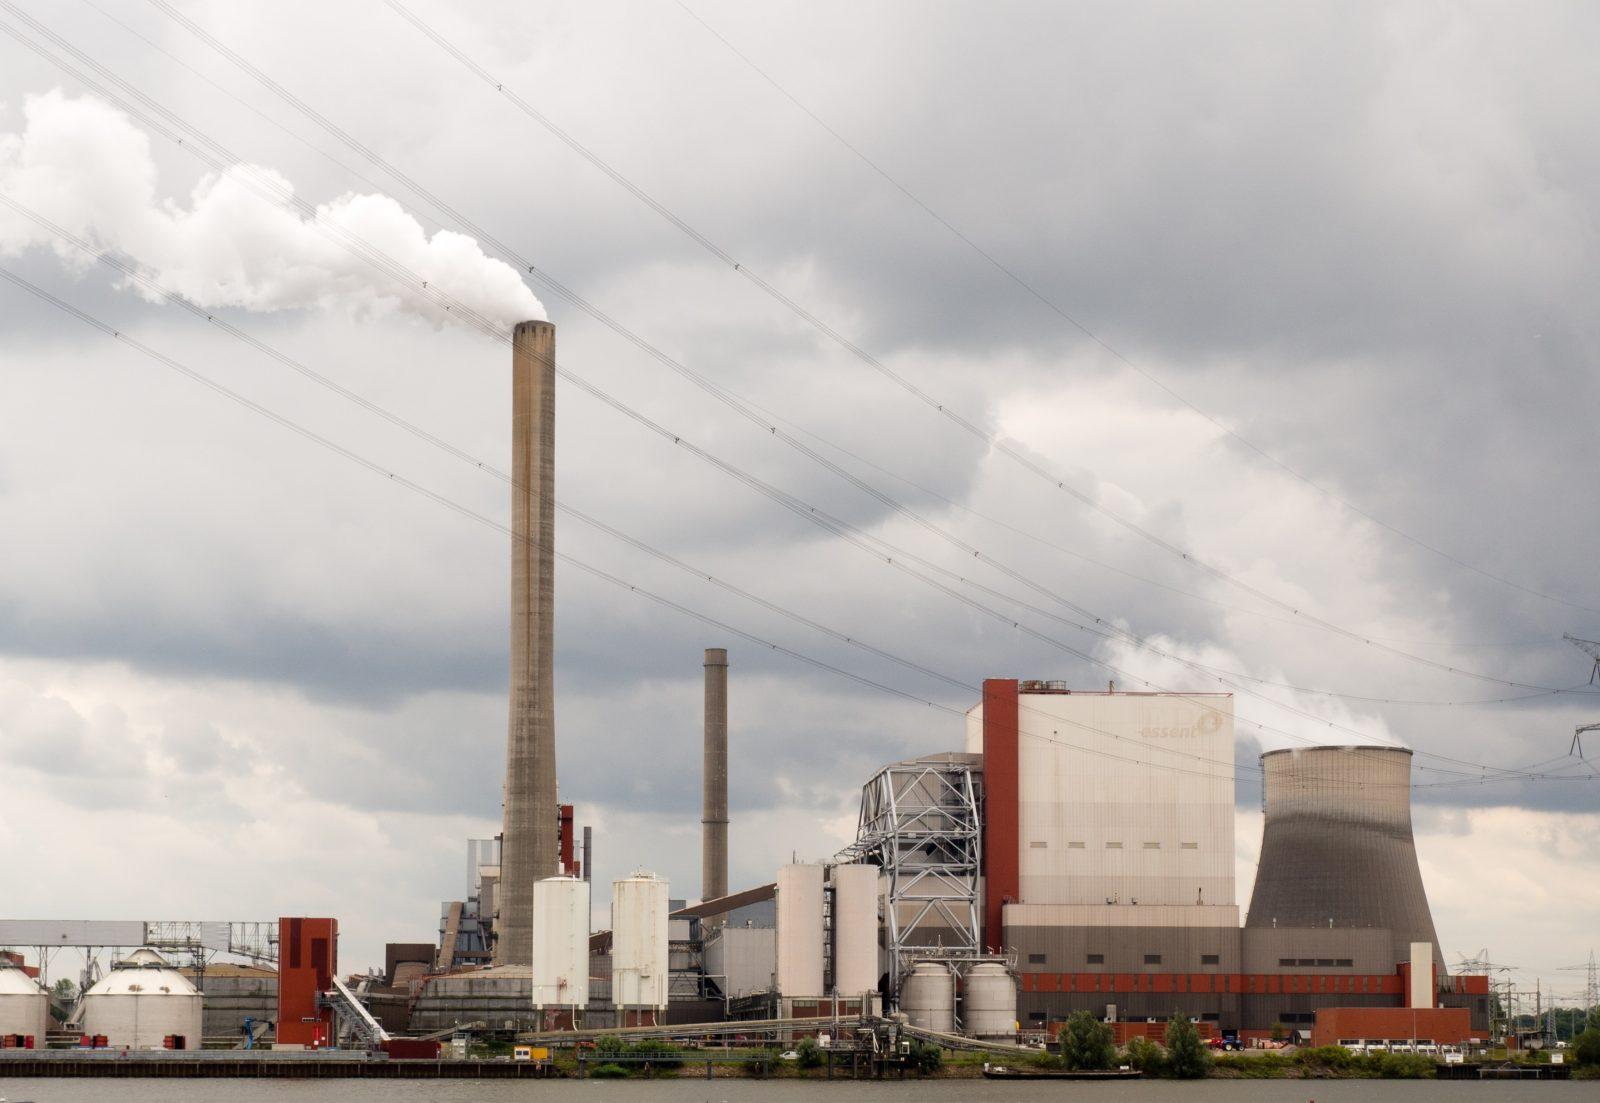 nuclear power plant under cloudy sky